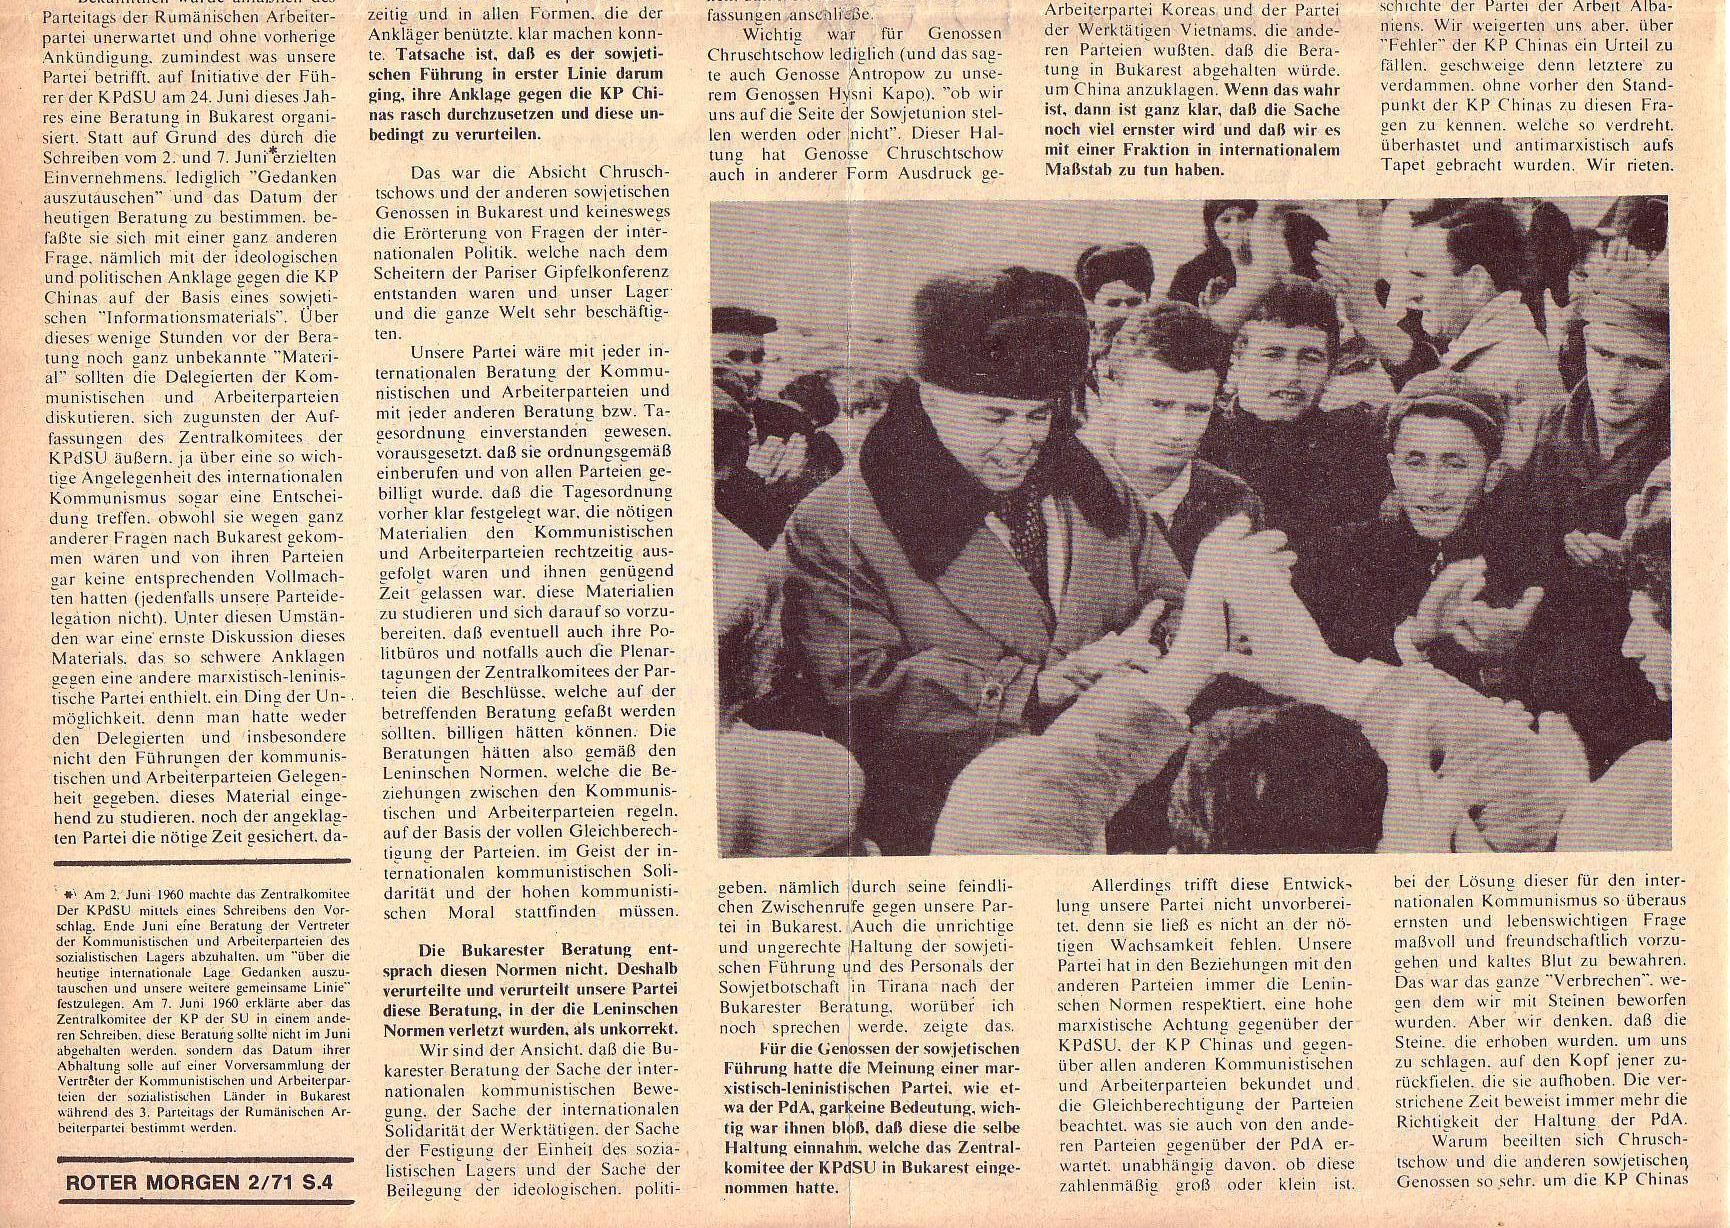 Roter Morgen, 5. Jg., Februar 1971, Nr. 2, Seite 4b